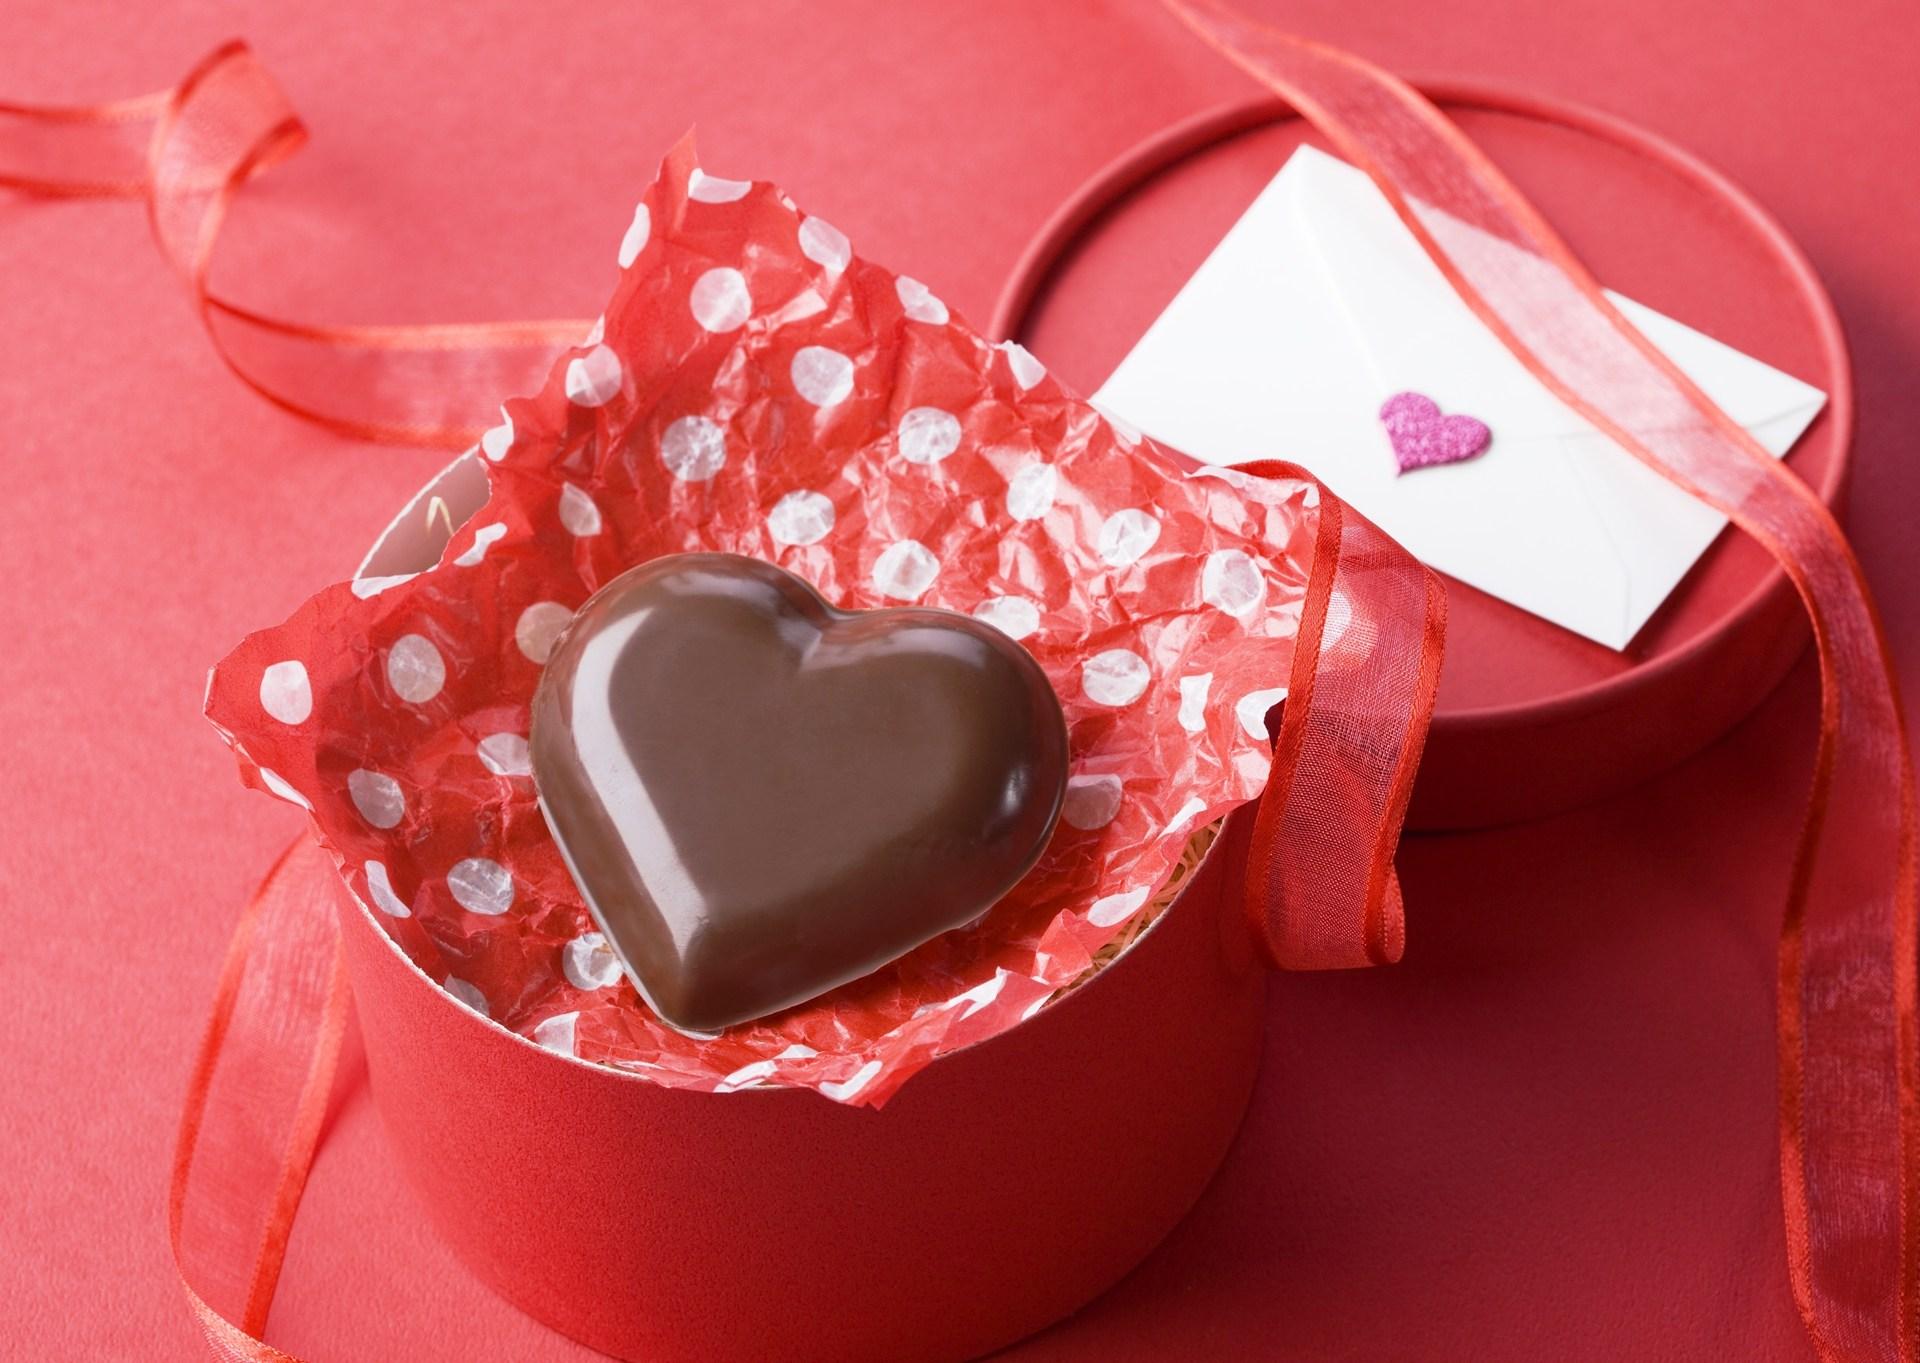 hinh nen chocolate 26